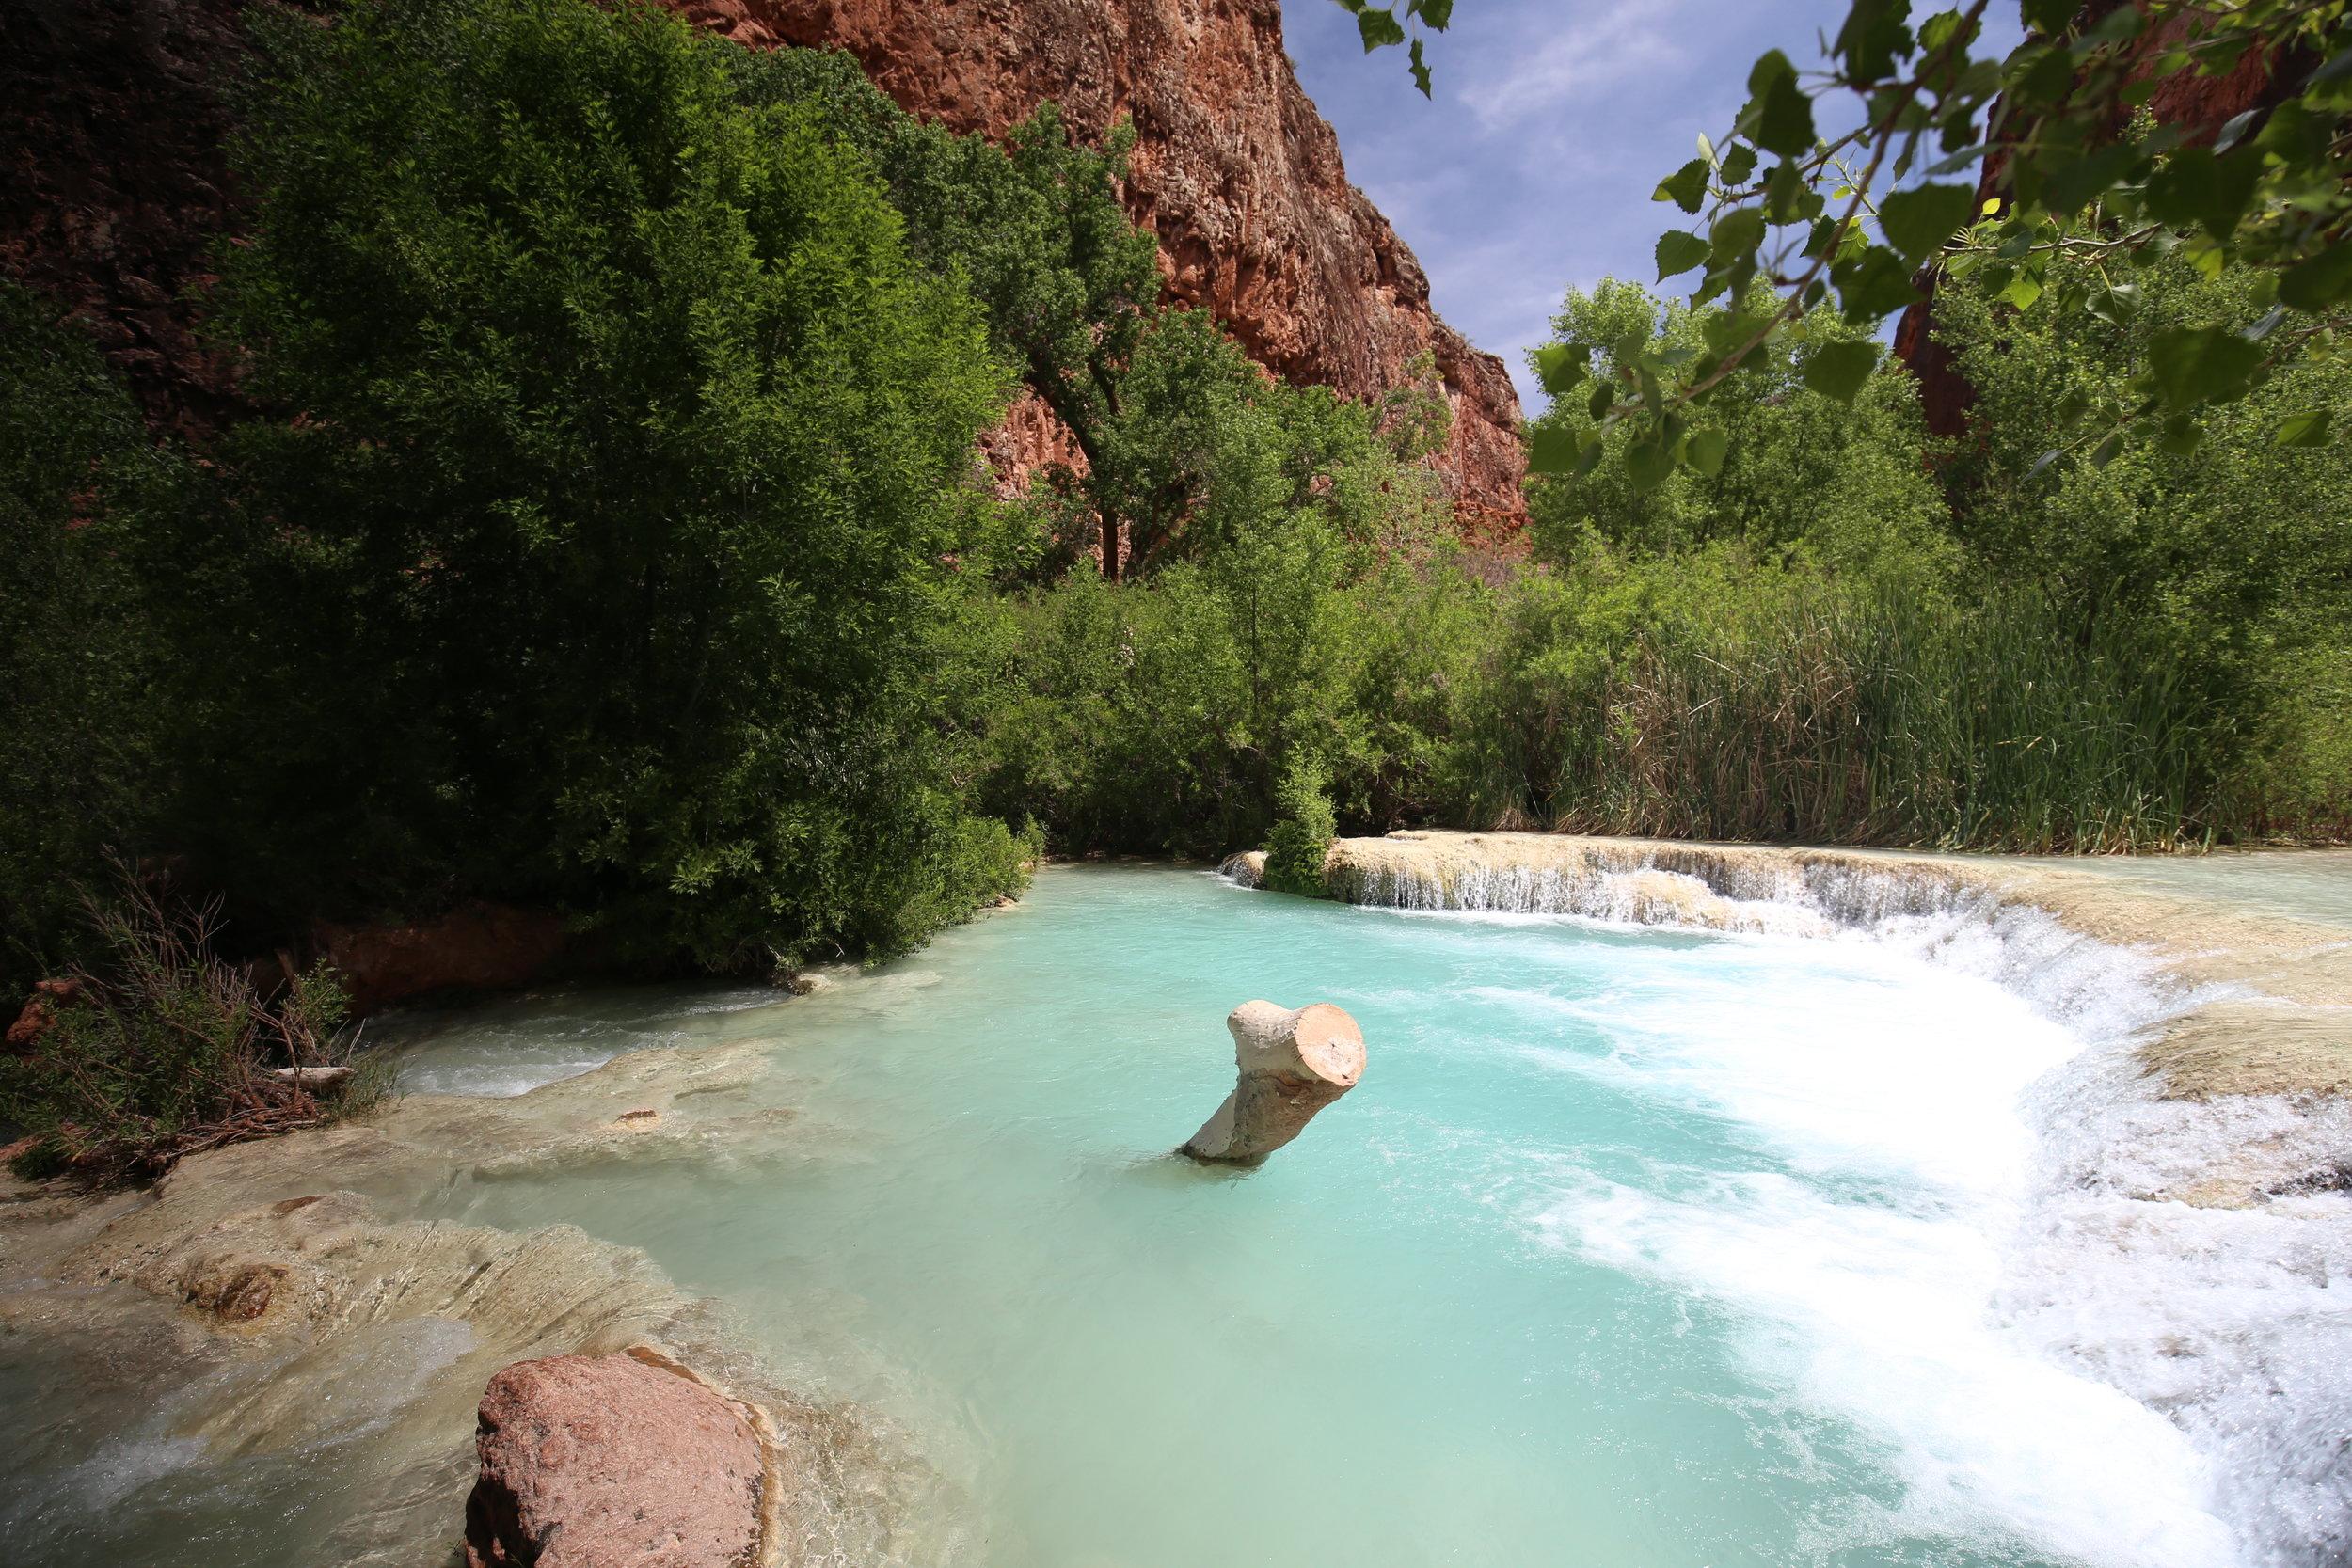 The milky blue waters of Havasupai, where you can swim in mermaid pools.